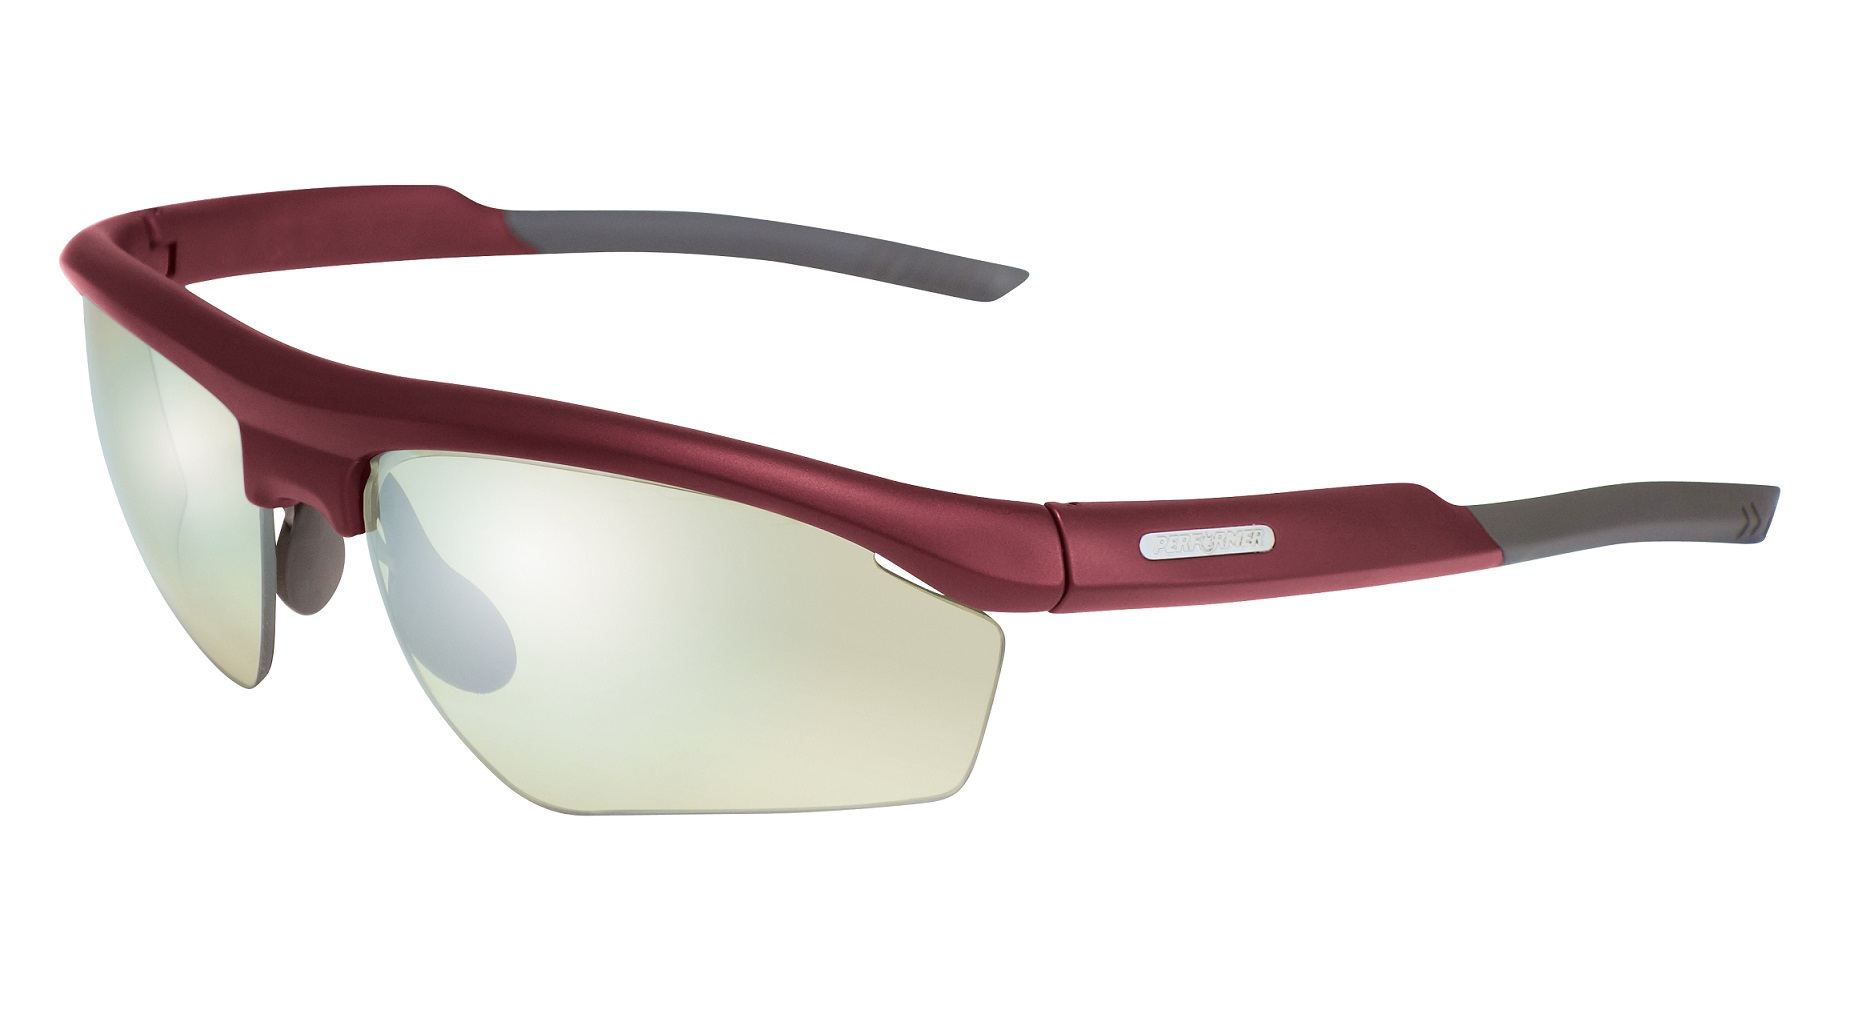 Performer Modell TTR 2.0 800 Sportbrille, Bikerbrille, Sonnenbrille.